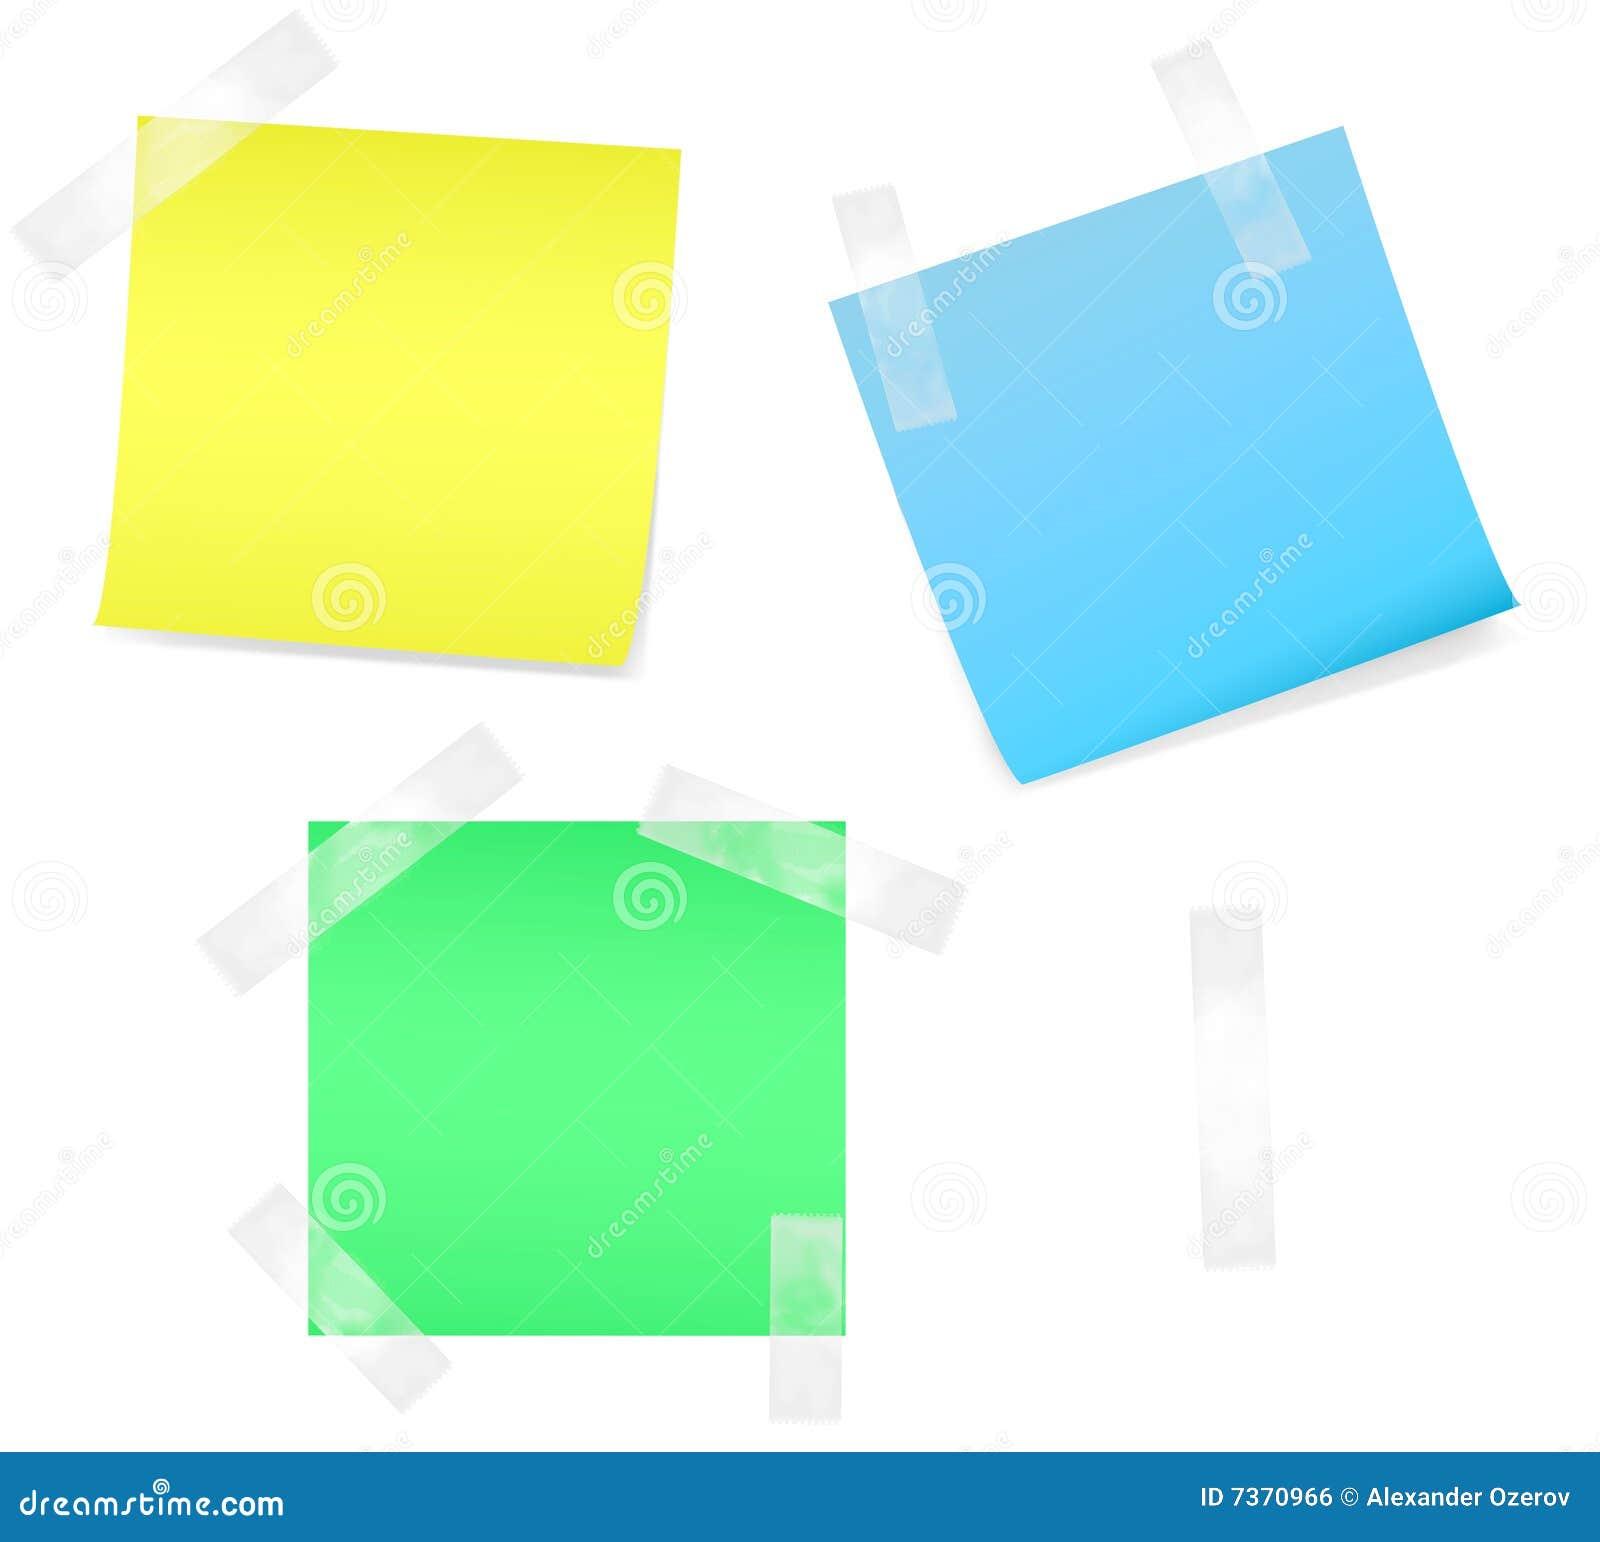 Farbiges Anmerkungspapier